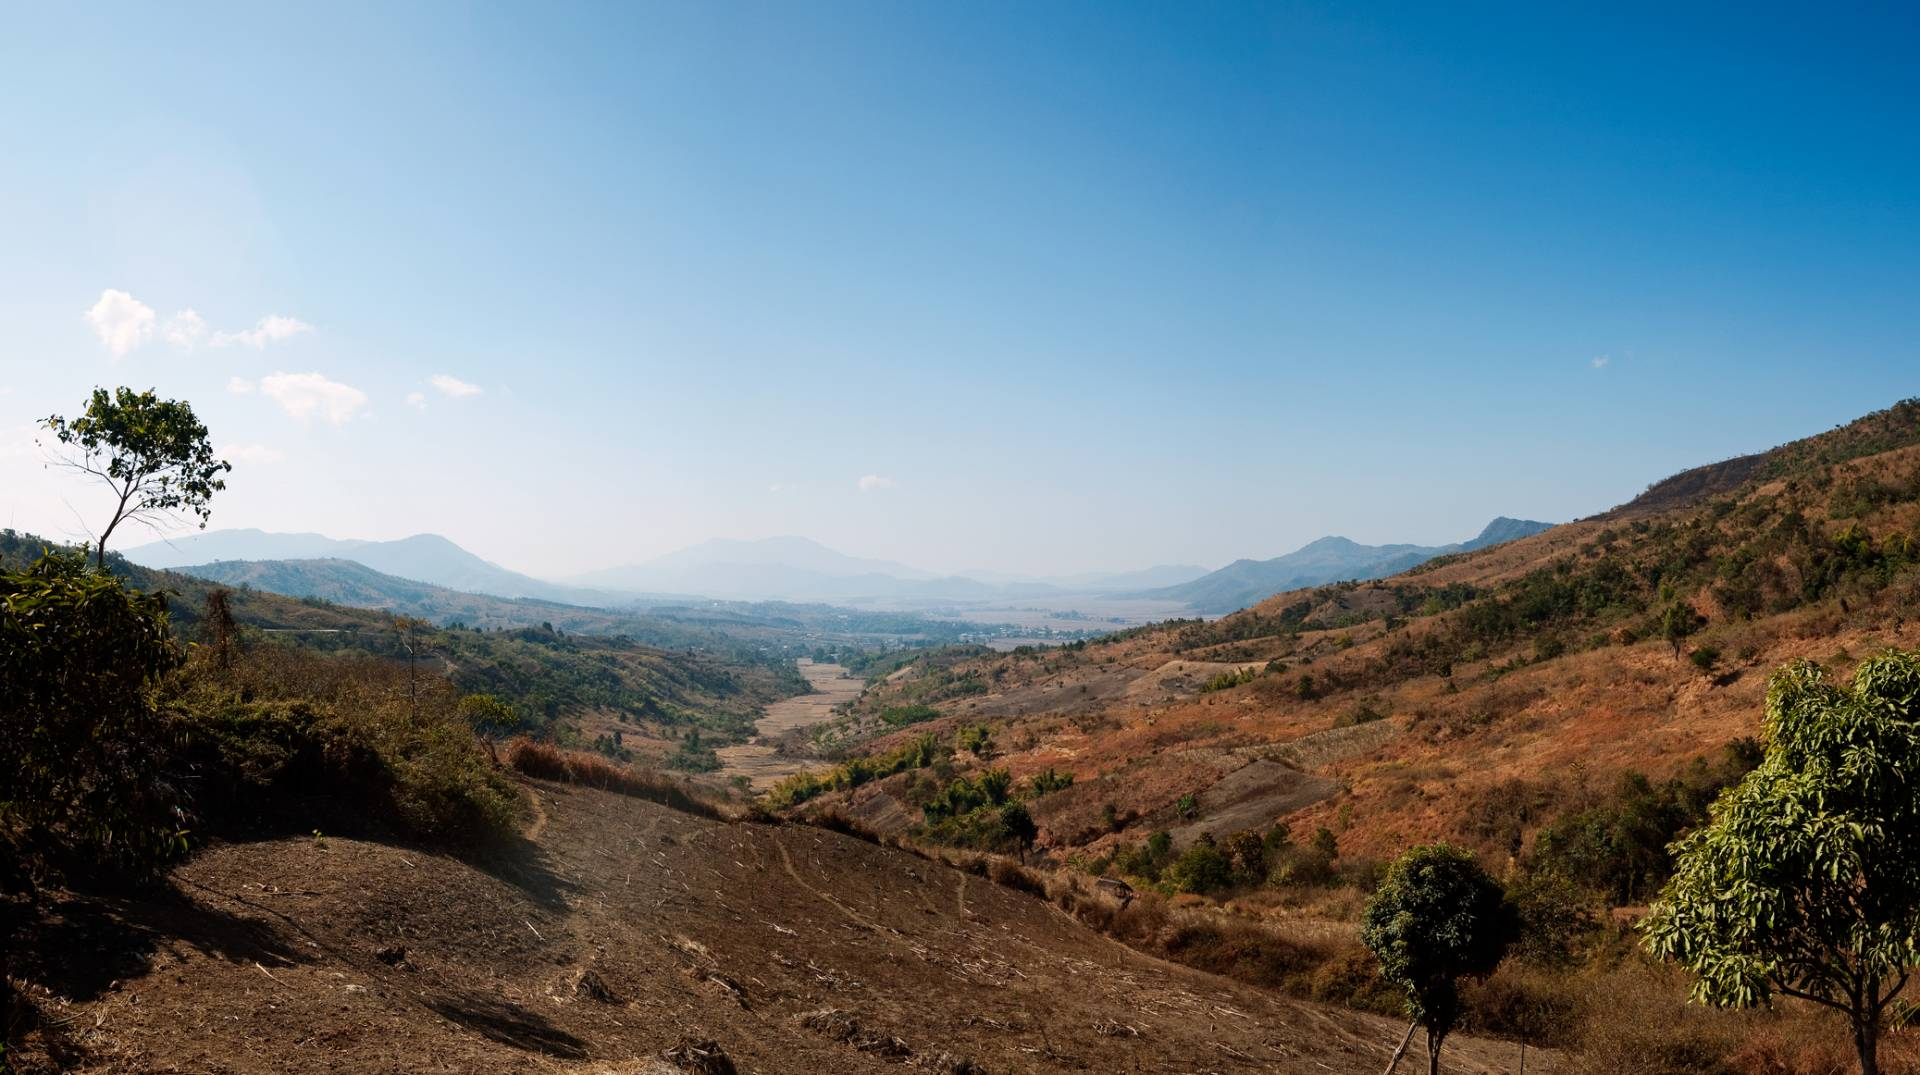 The Imphal Plain